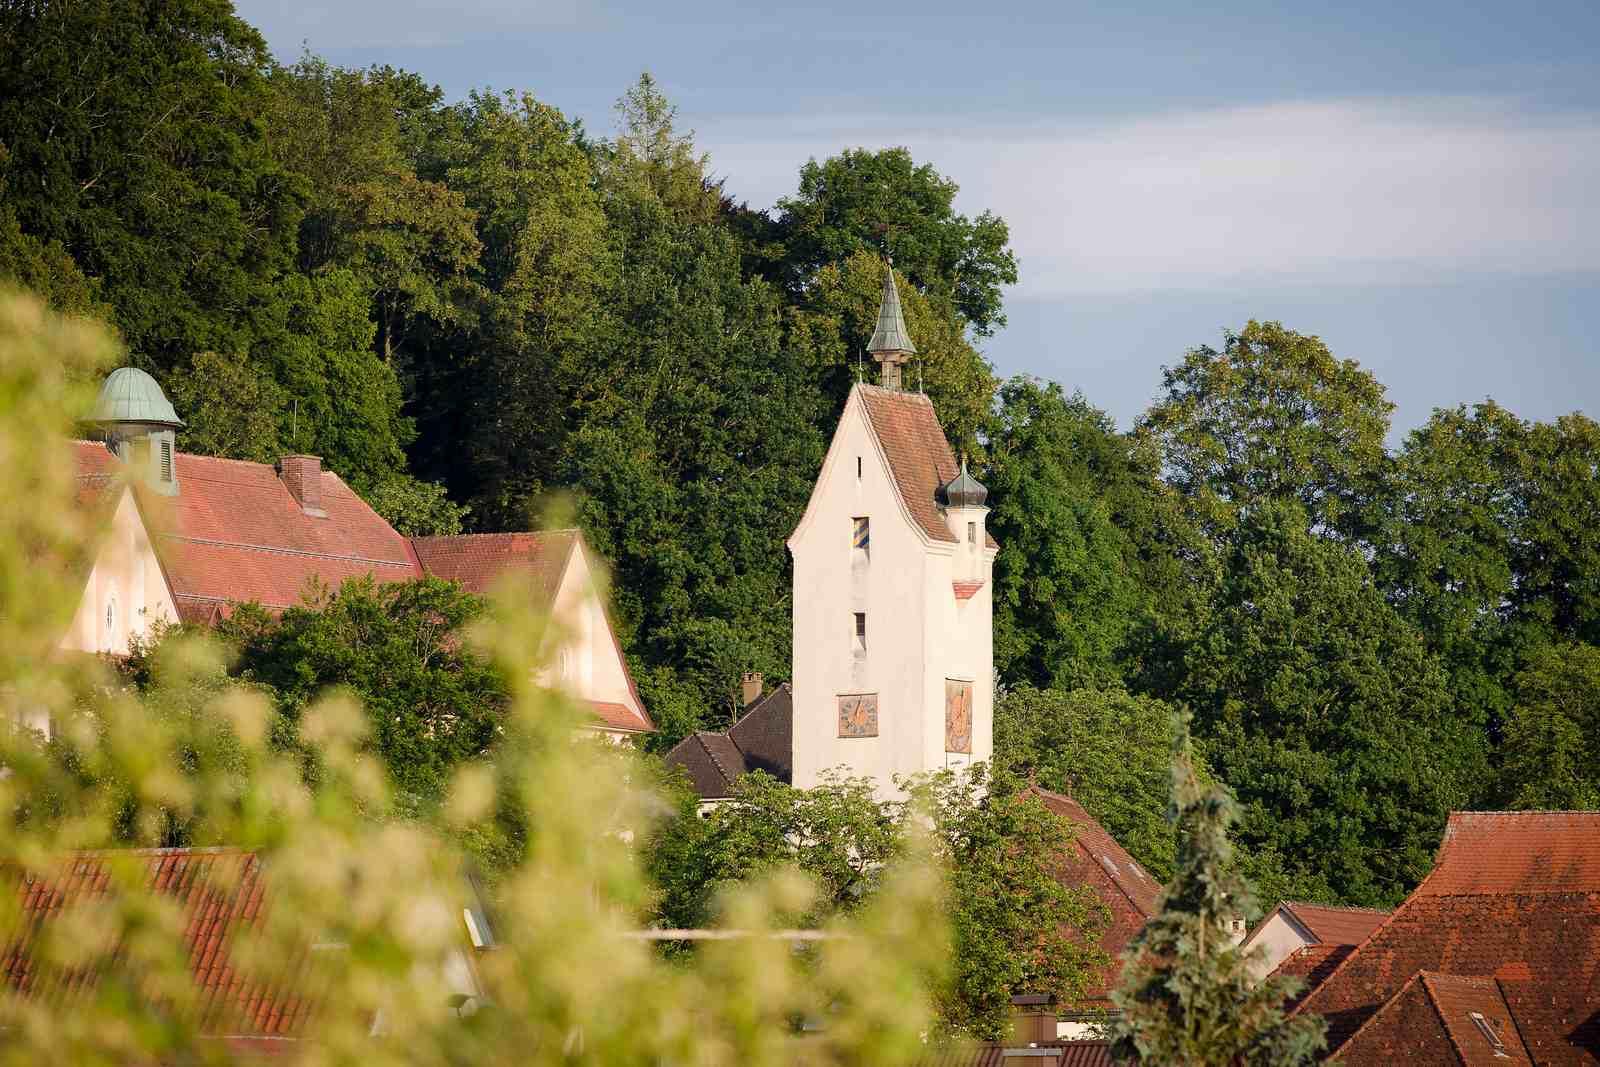 Bockturm in der Leutkircher Altstadt